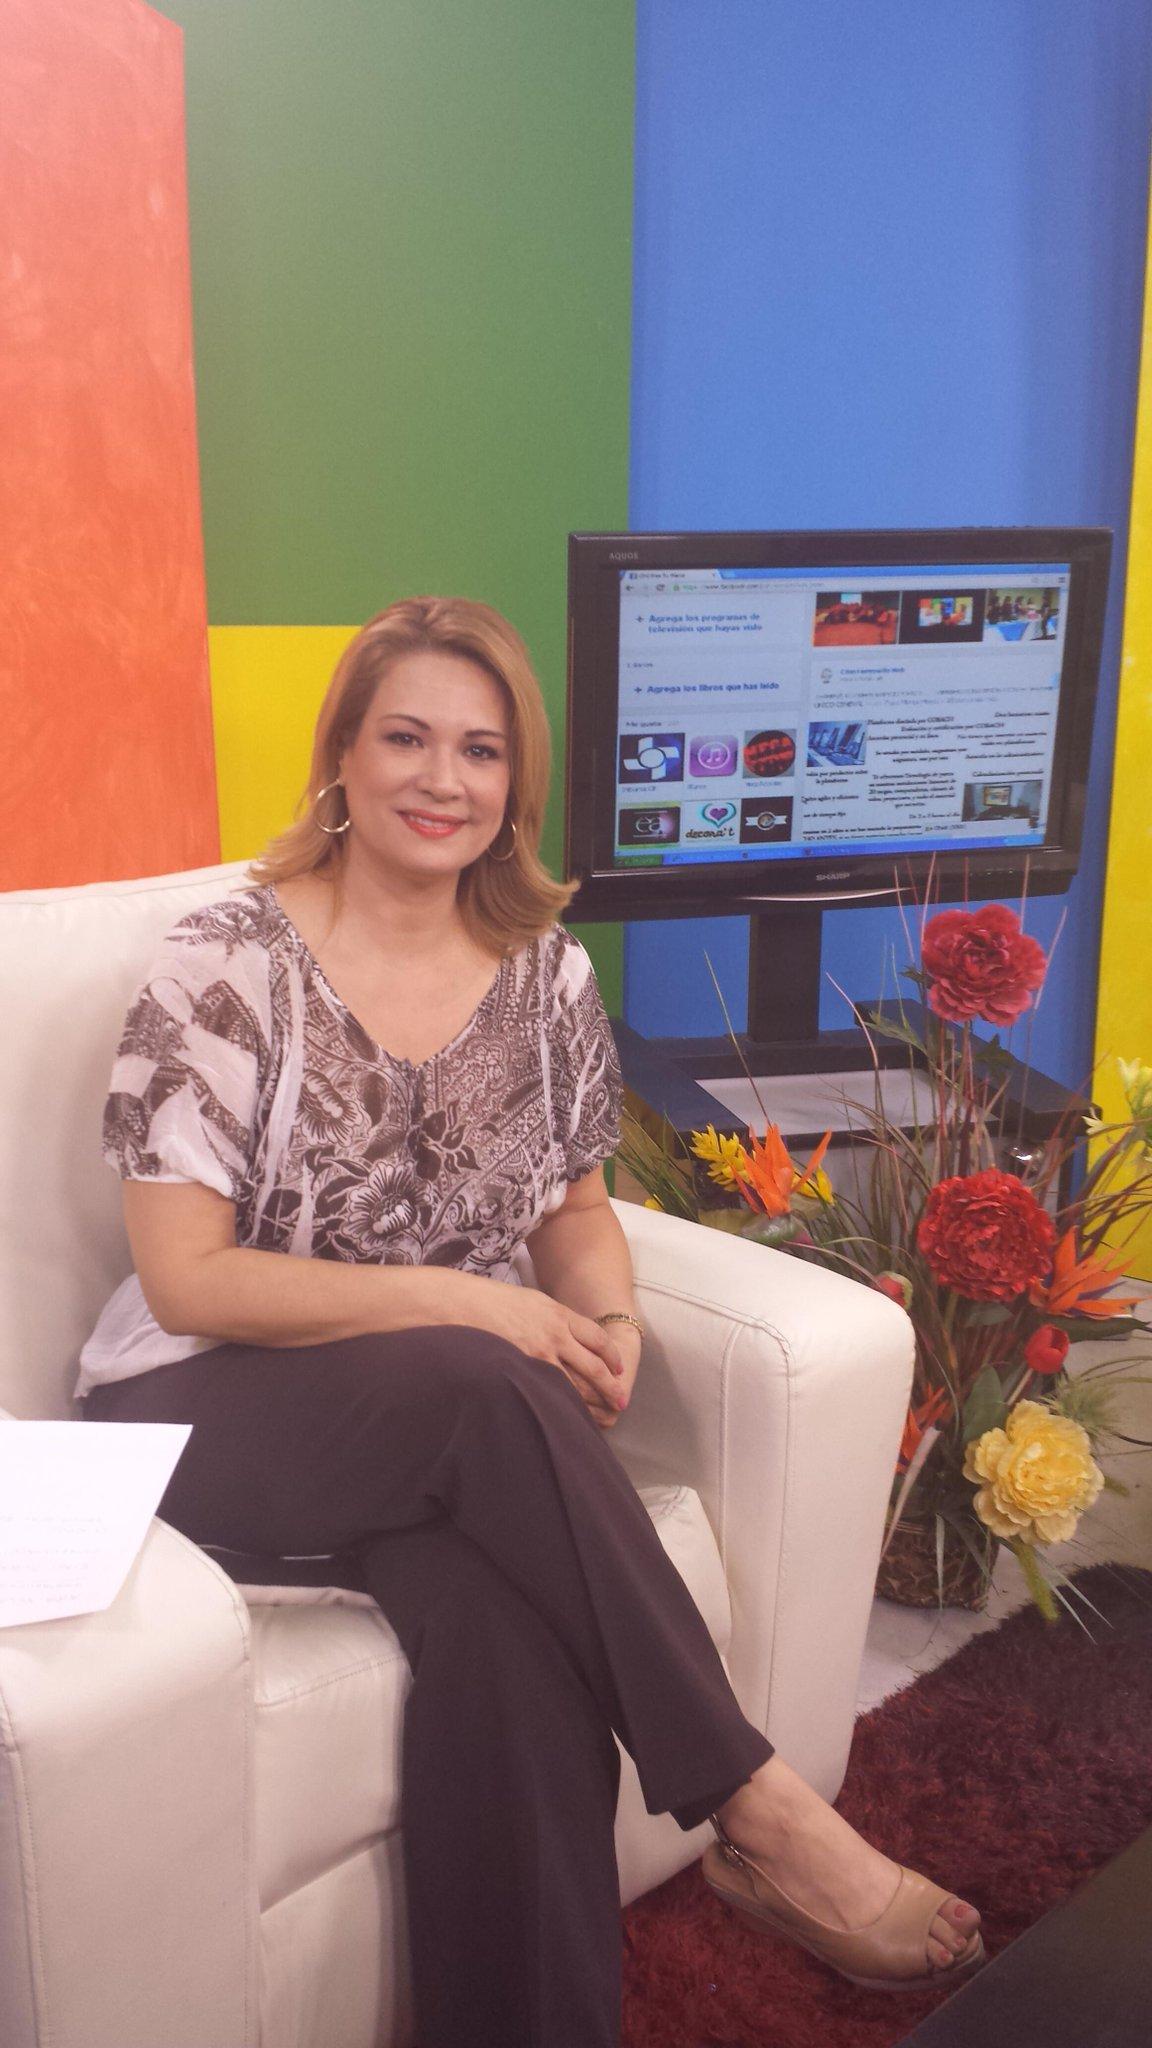 Al aire de 1 a 2pm canal 210 de megacable PON TU MARCA con Lorenia Burruel http://t.co/YbyGO9TcPP